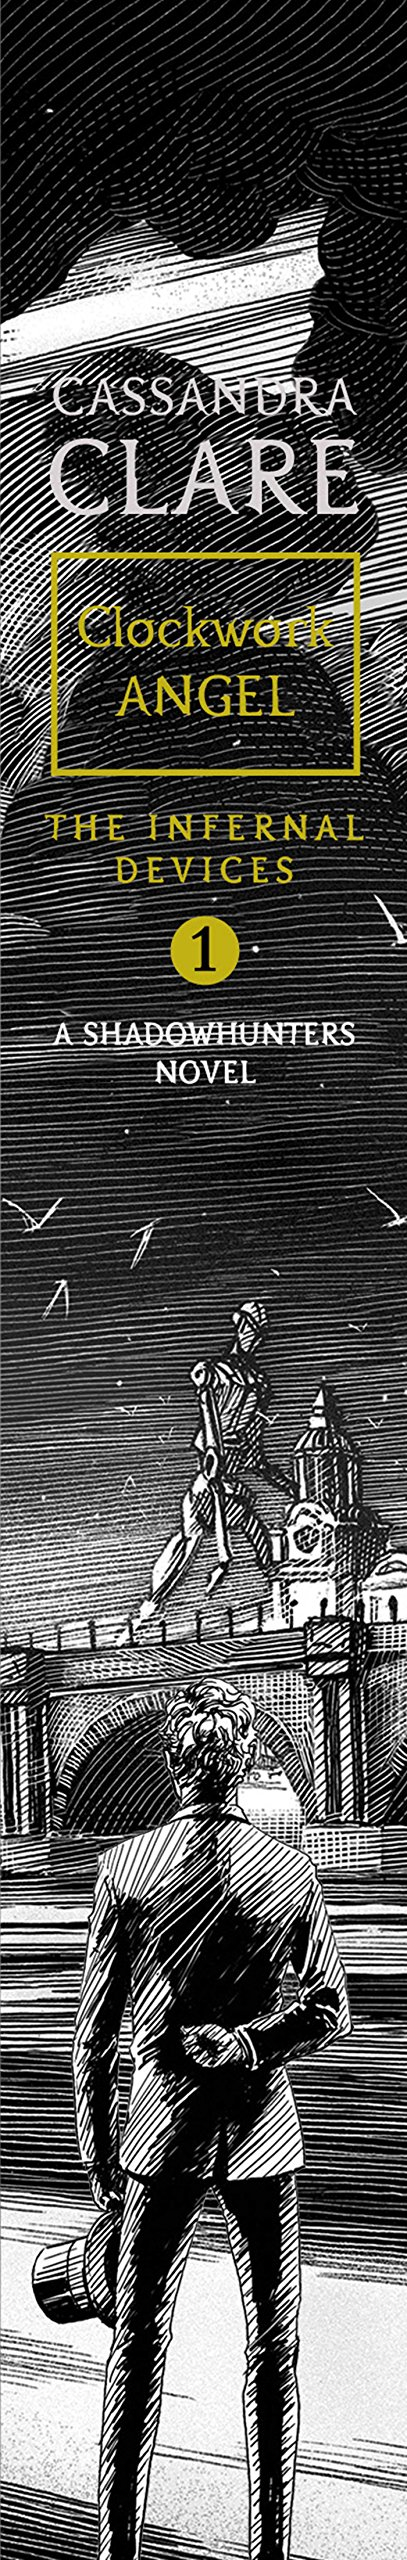 Amazon: Clockwork Angel (the Infernal Devices) (9781481456029):  Cassandra Clare: Books